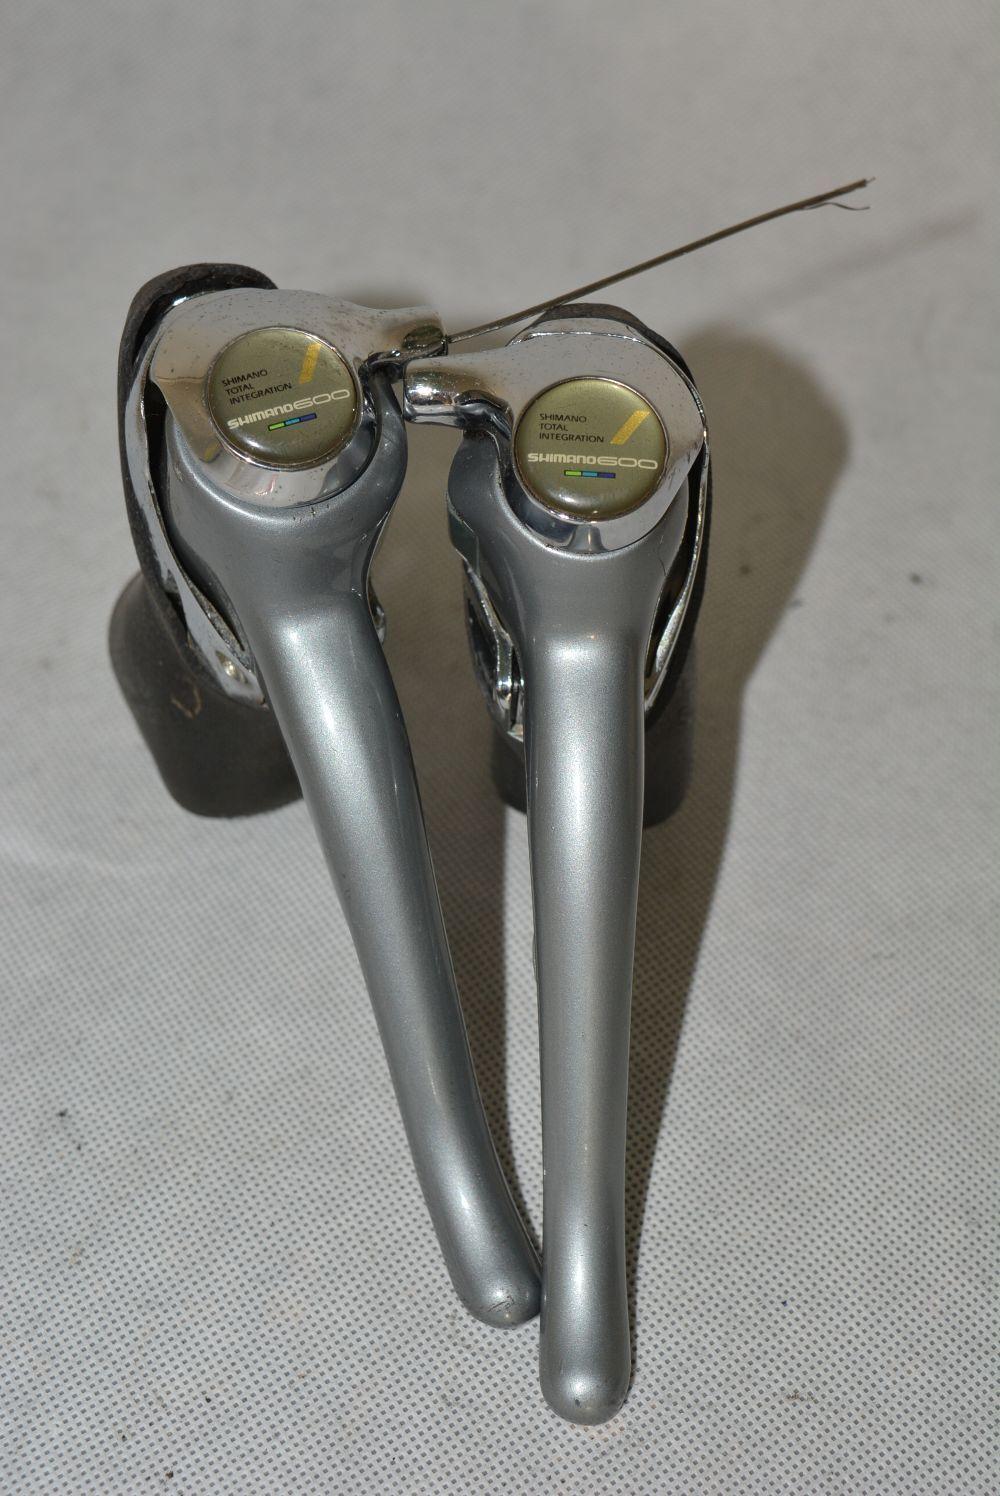 SHIMANO 600 triColoreee 2x8 shifting brake levers    VGC    shifters